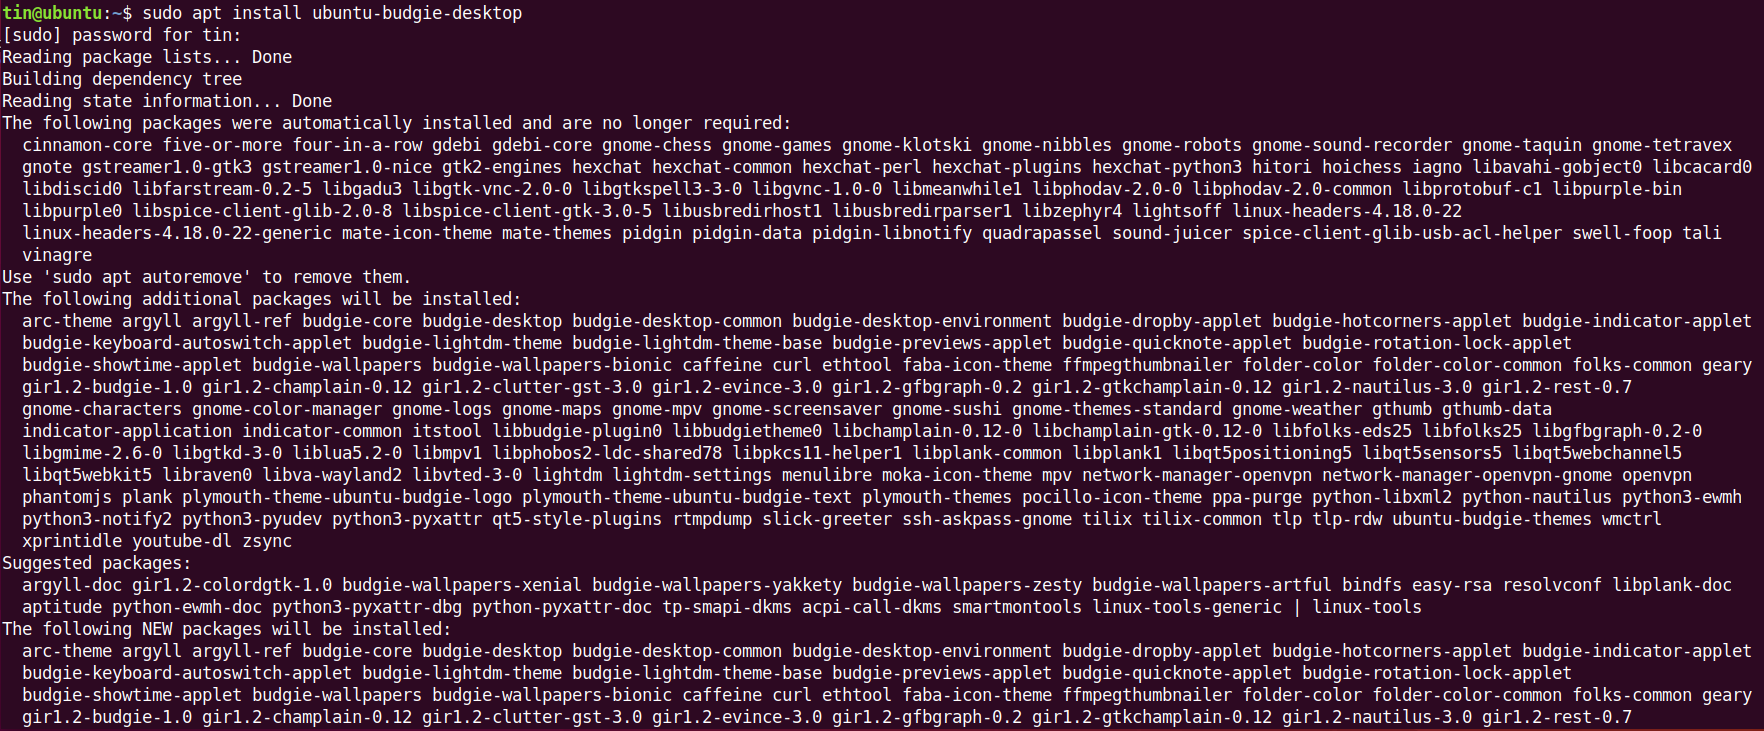 Install ubuntu-budgie-desktop